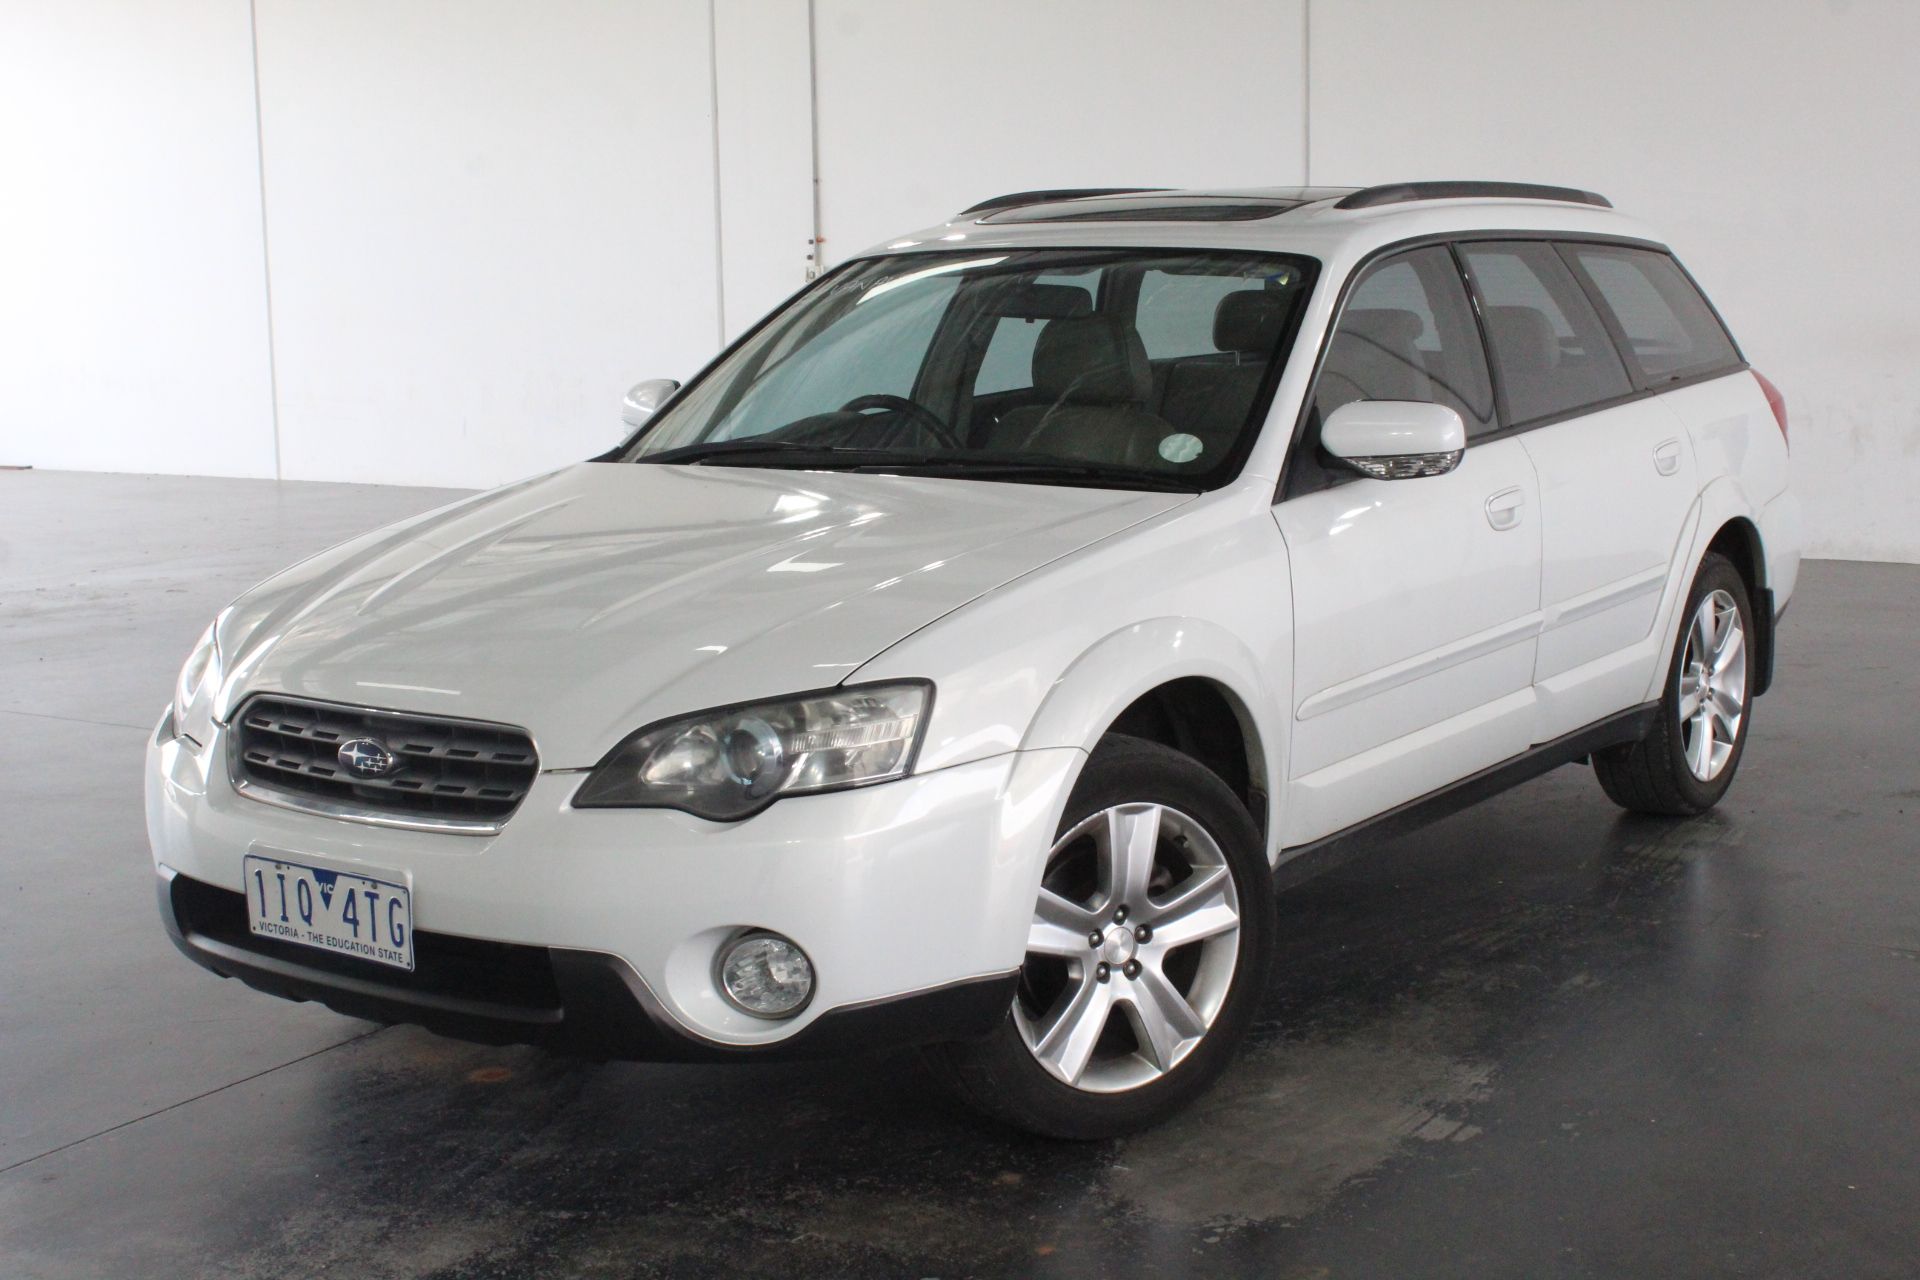 2005 Subaru Outback 3.0R Premium Touring Wagon B4A Automatic Wagon